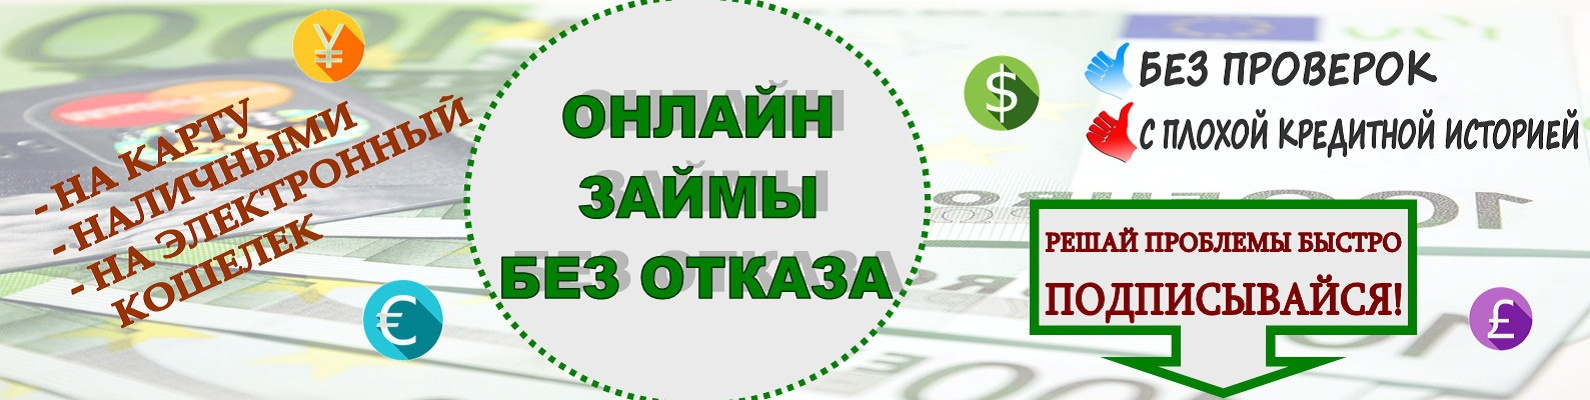 Частный Кредитор - Кредит до 200000 грн без залога